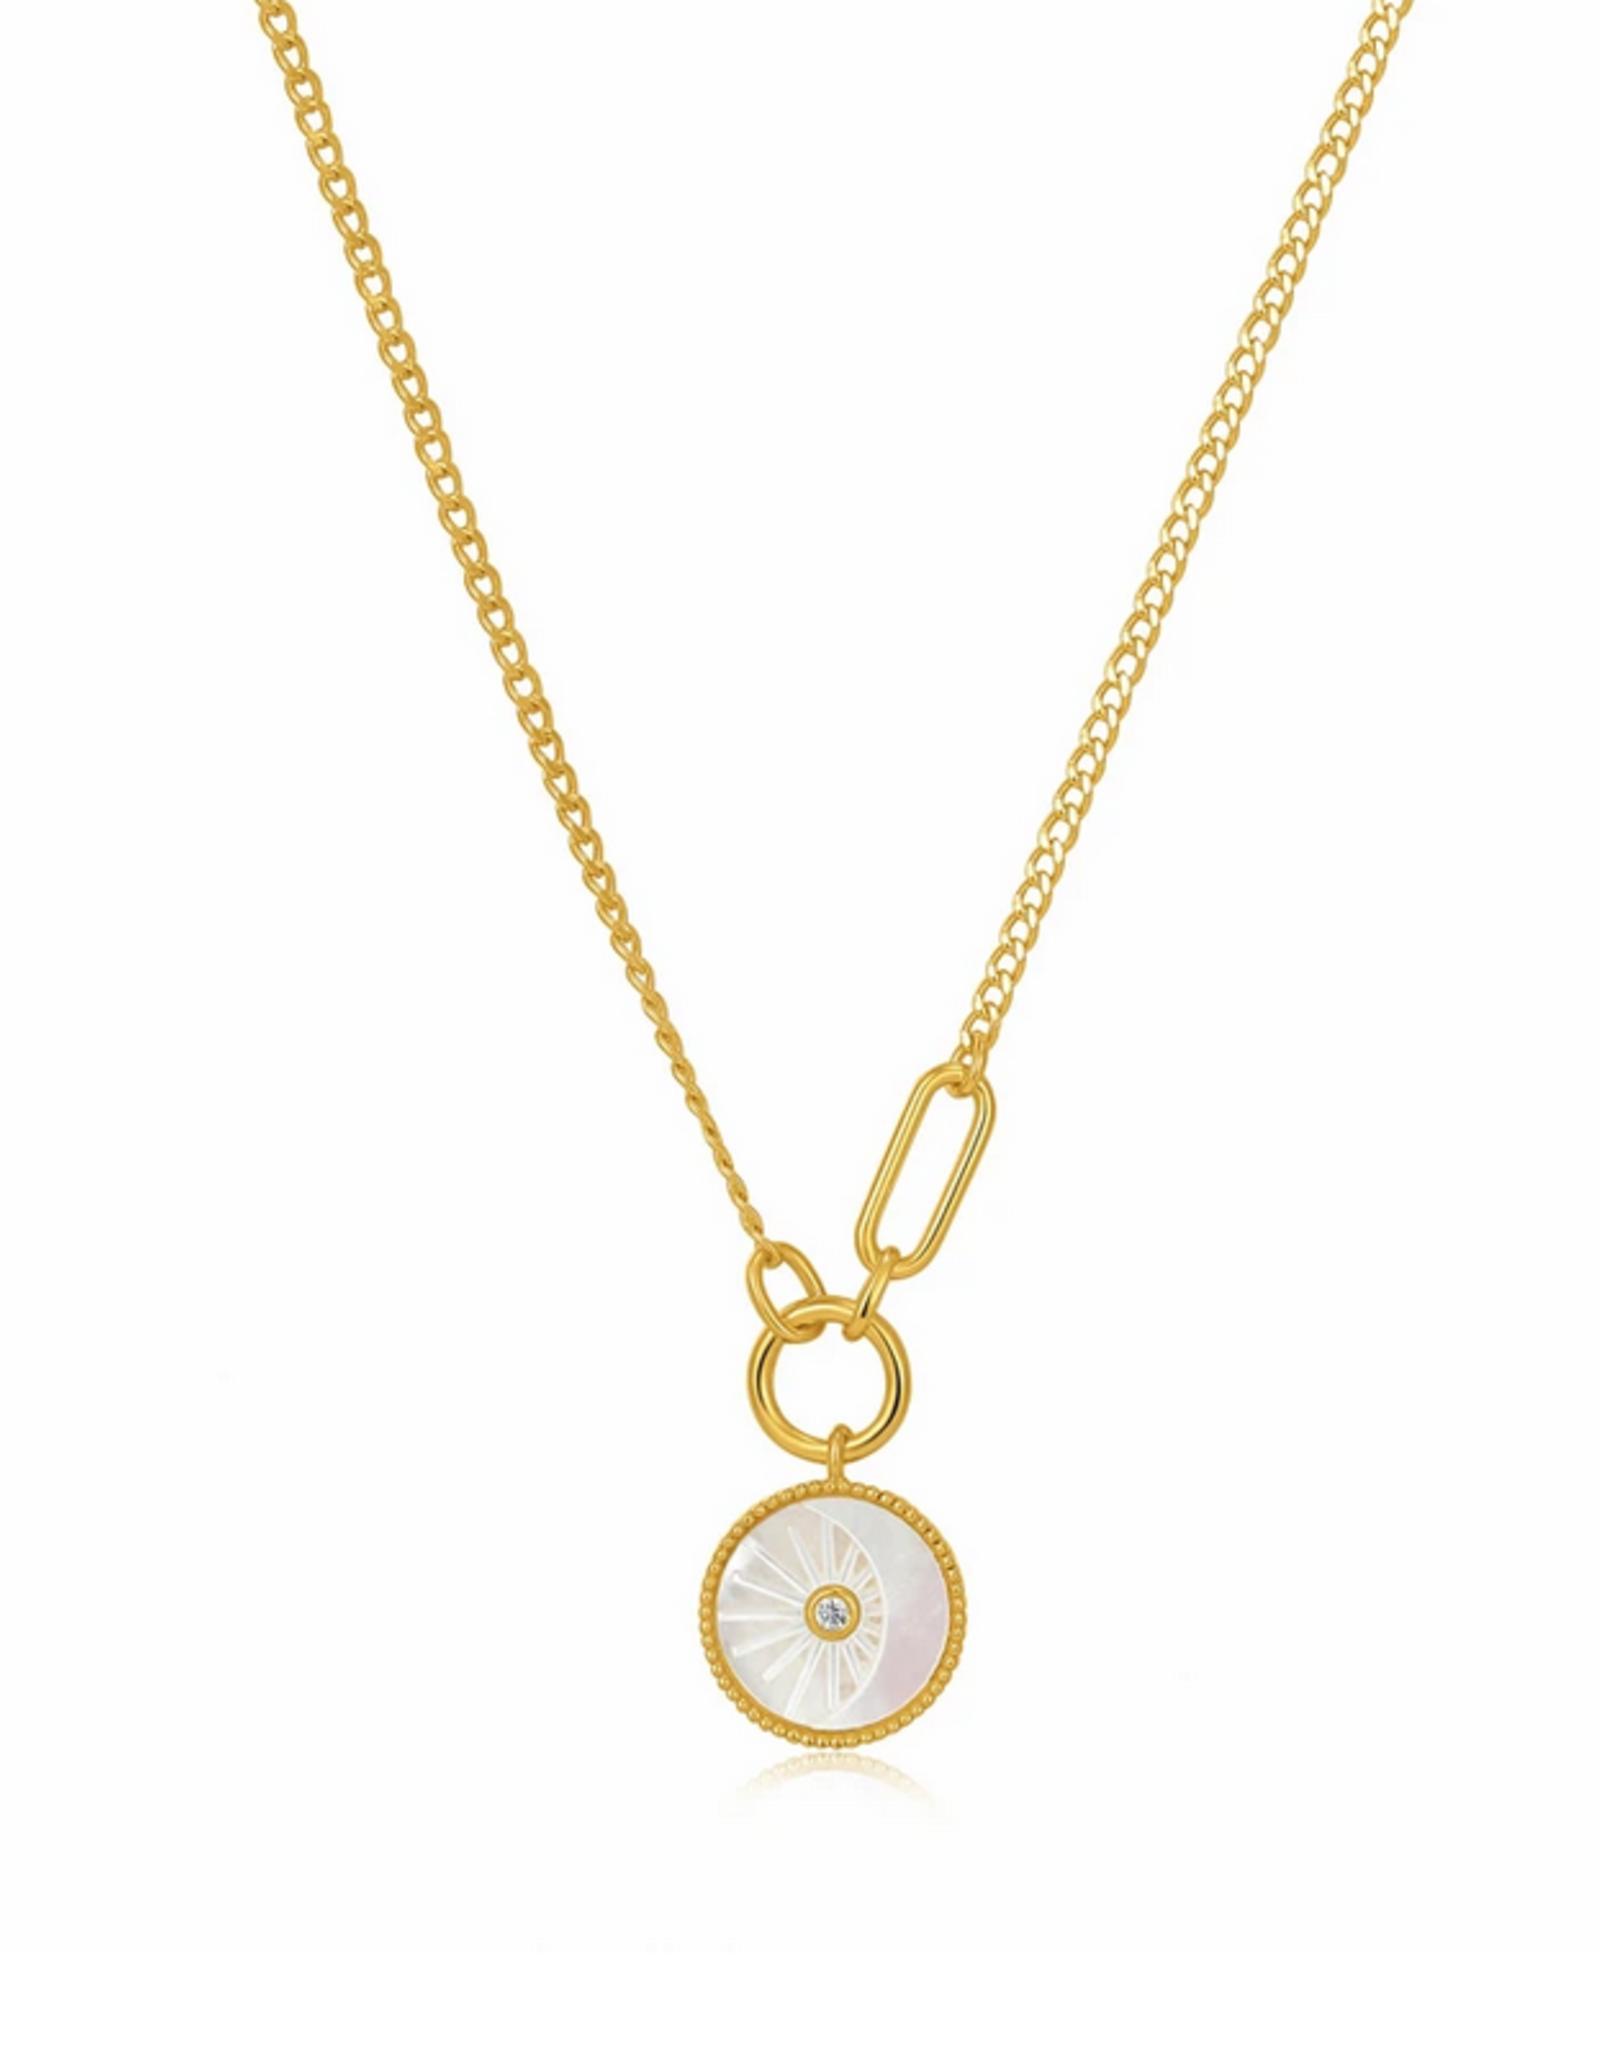 Ania Haie Ania Haie - Eclipse emblem - gold necklace